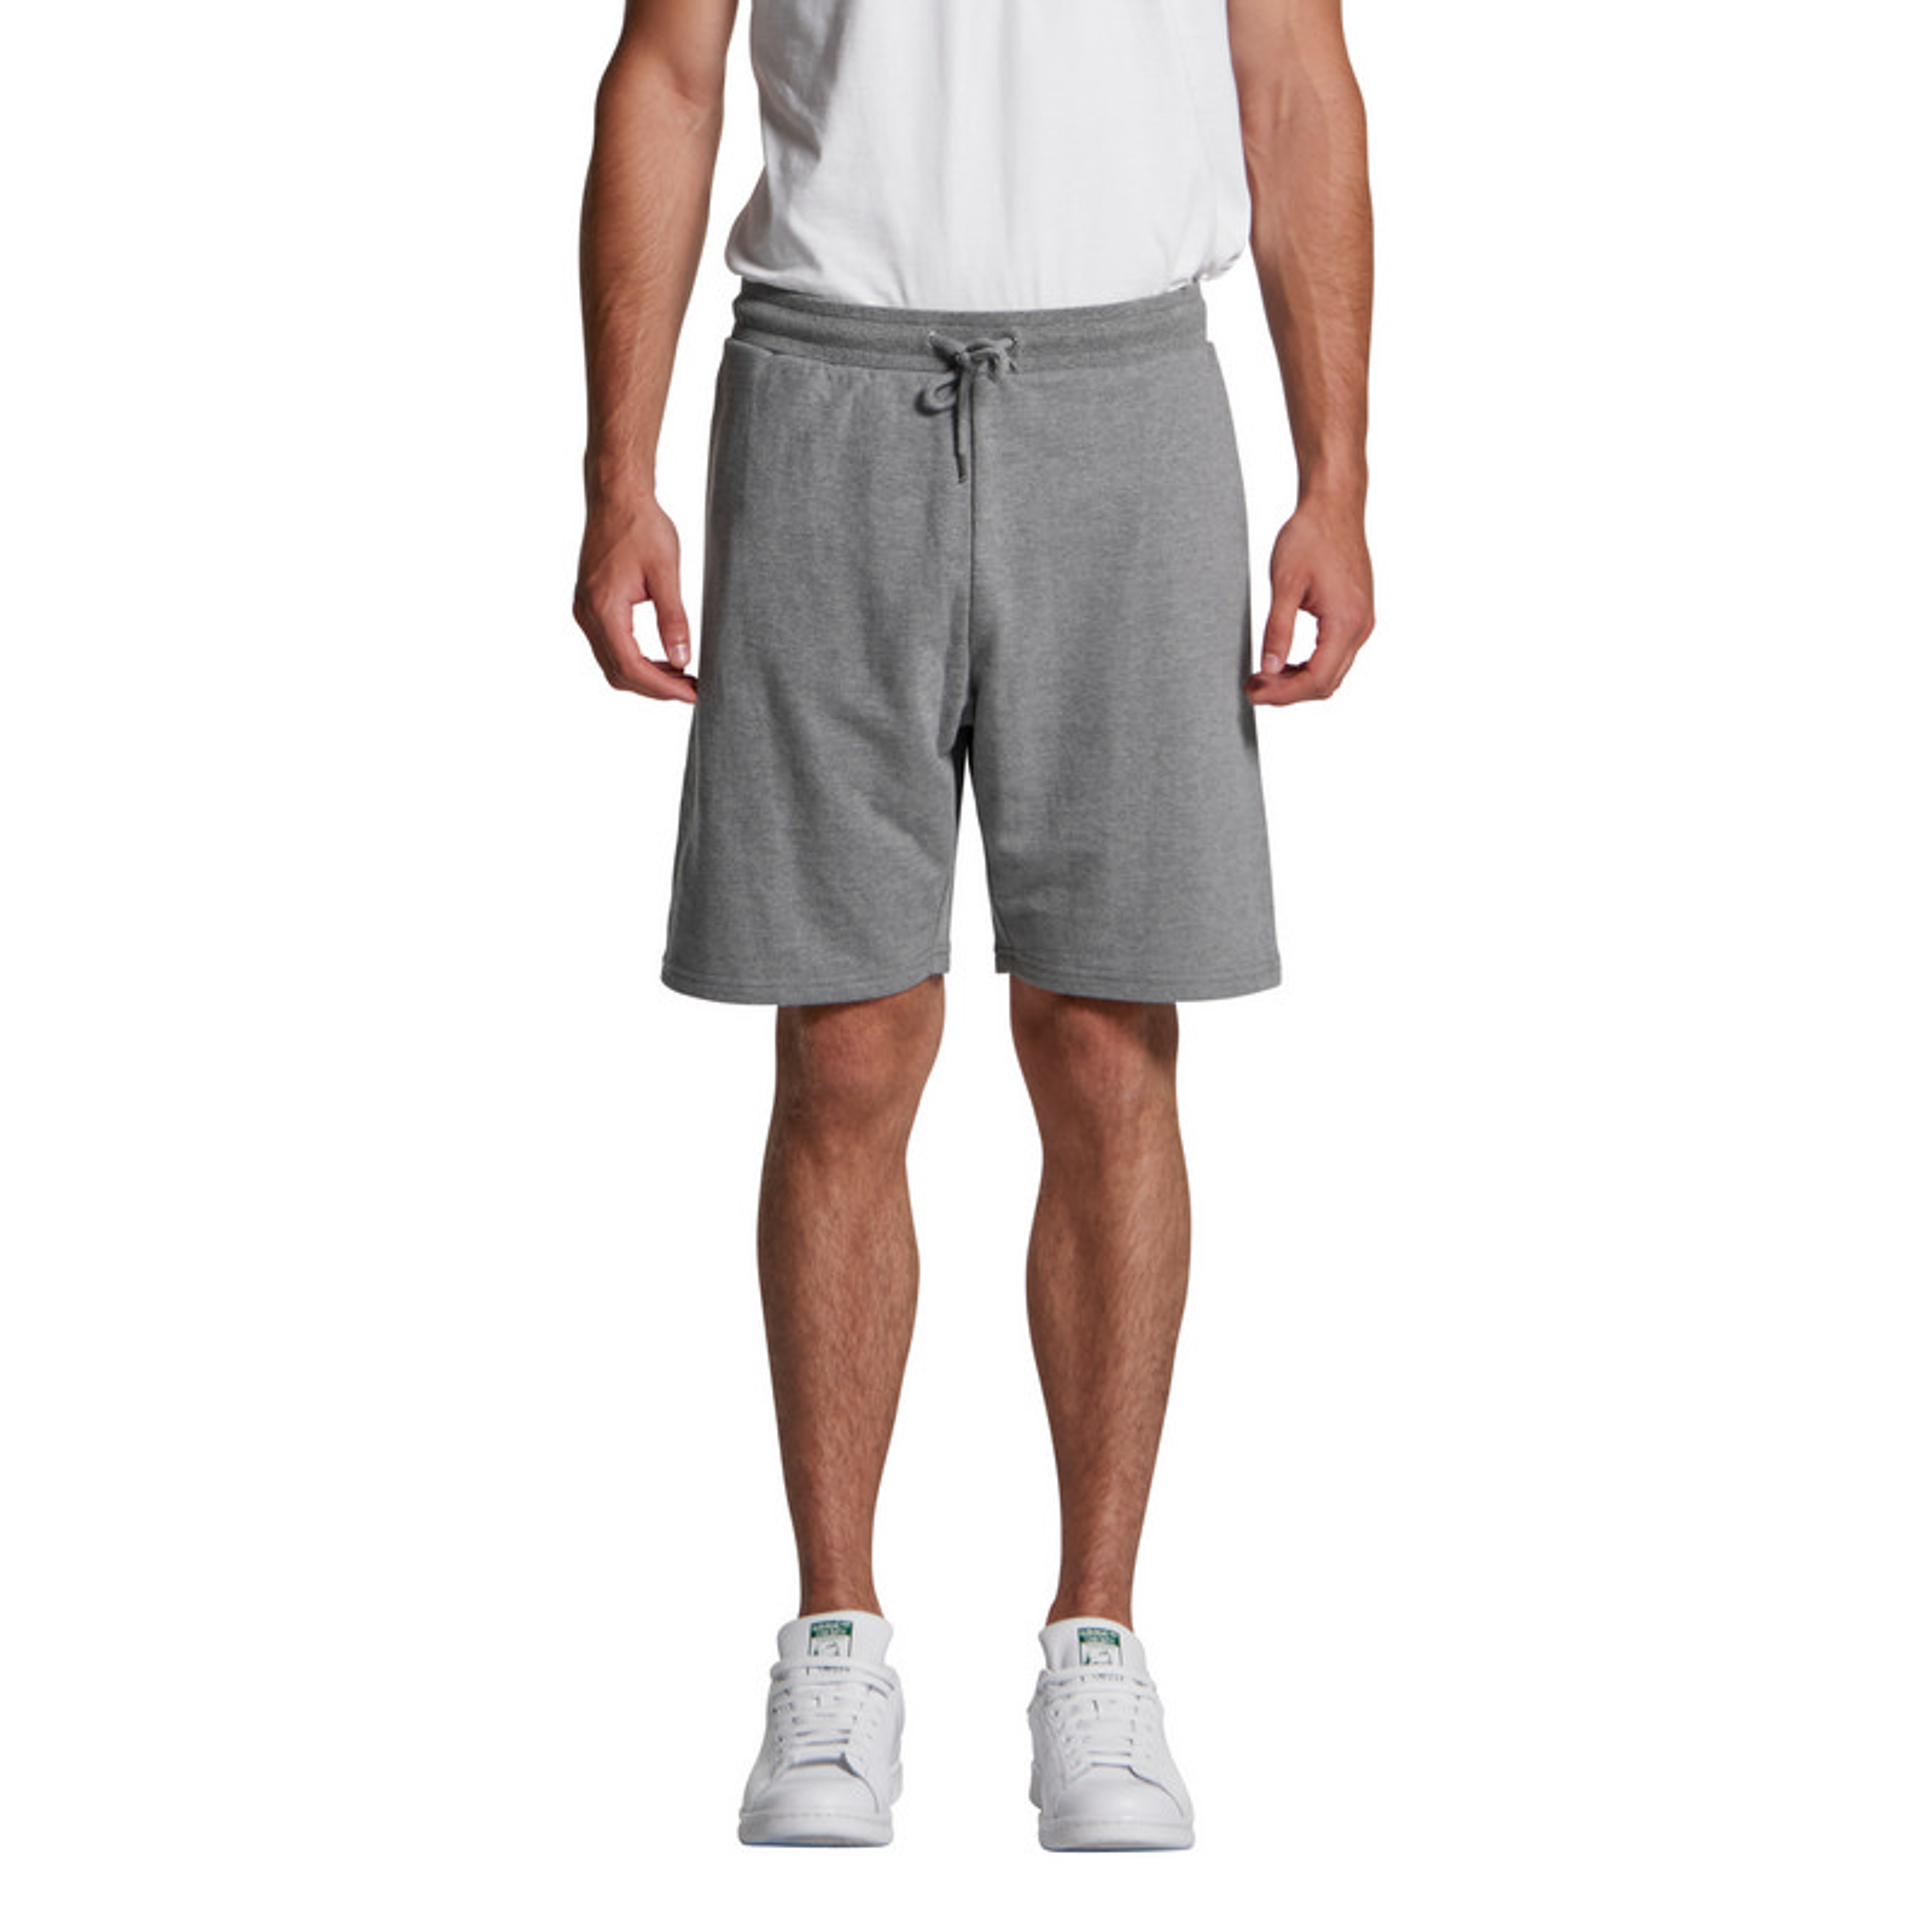 Stadium Shorts (5916_AS)